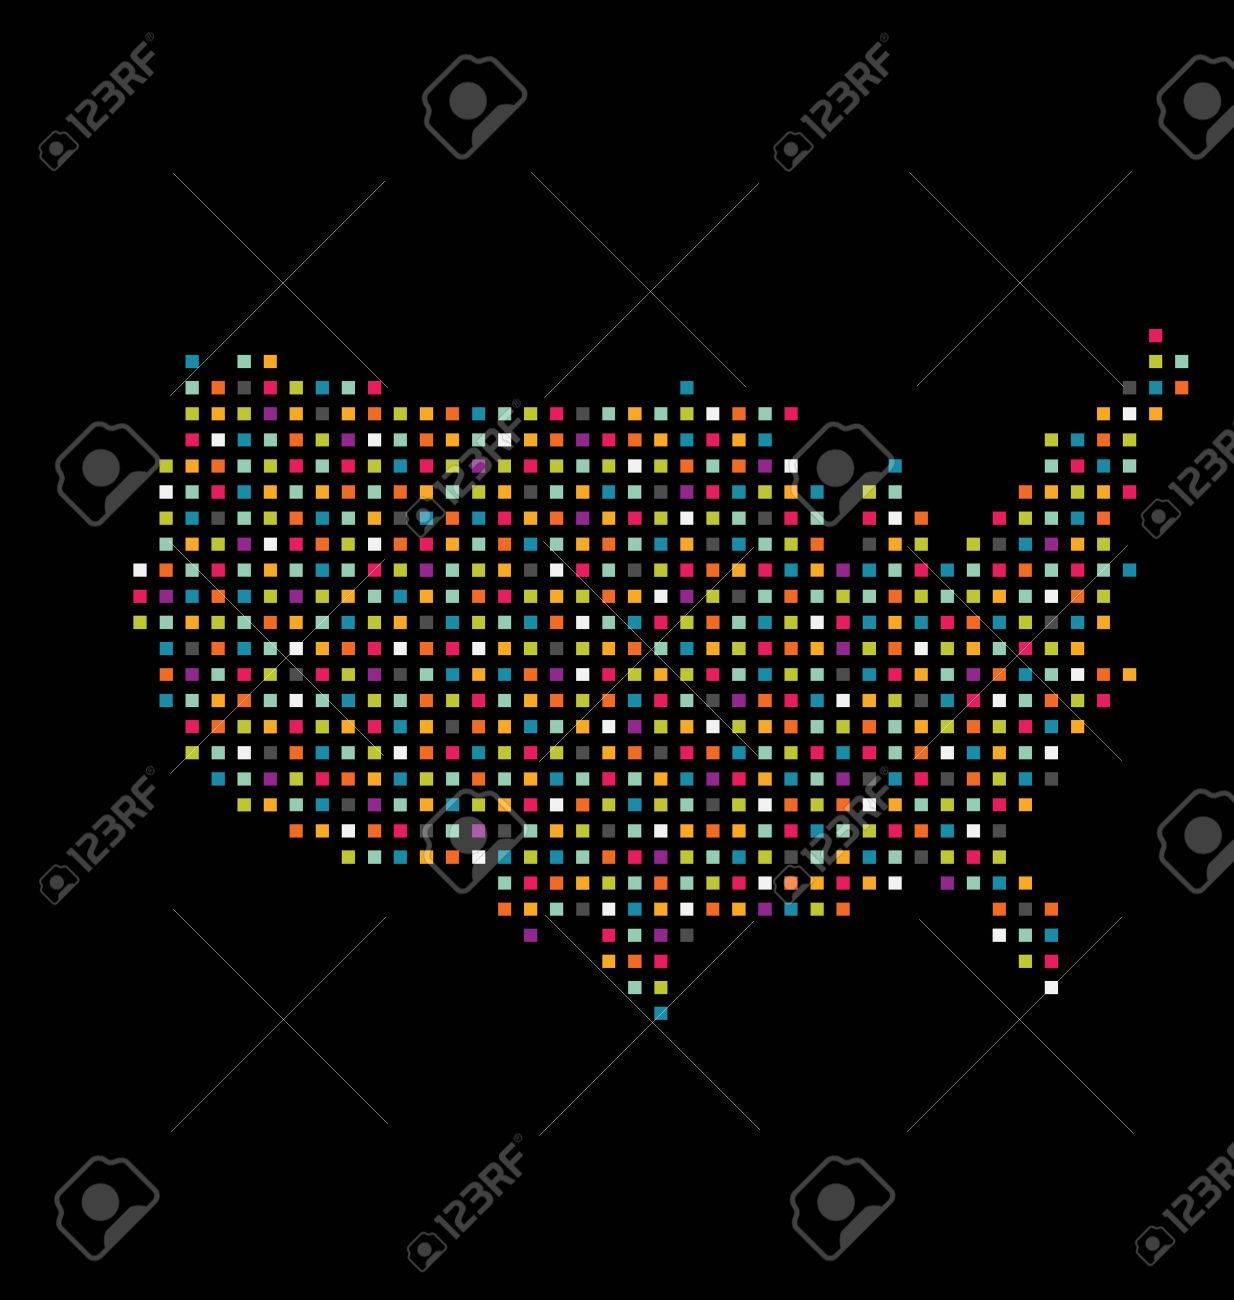 Visual Inspiration Dot Map Petri Projects Google Street View - Us census dot map